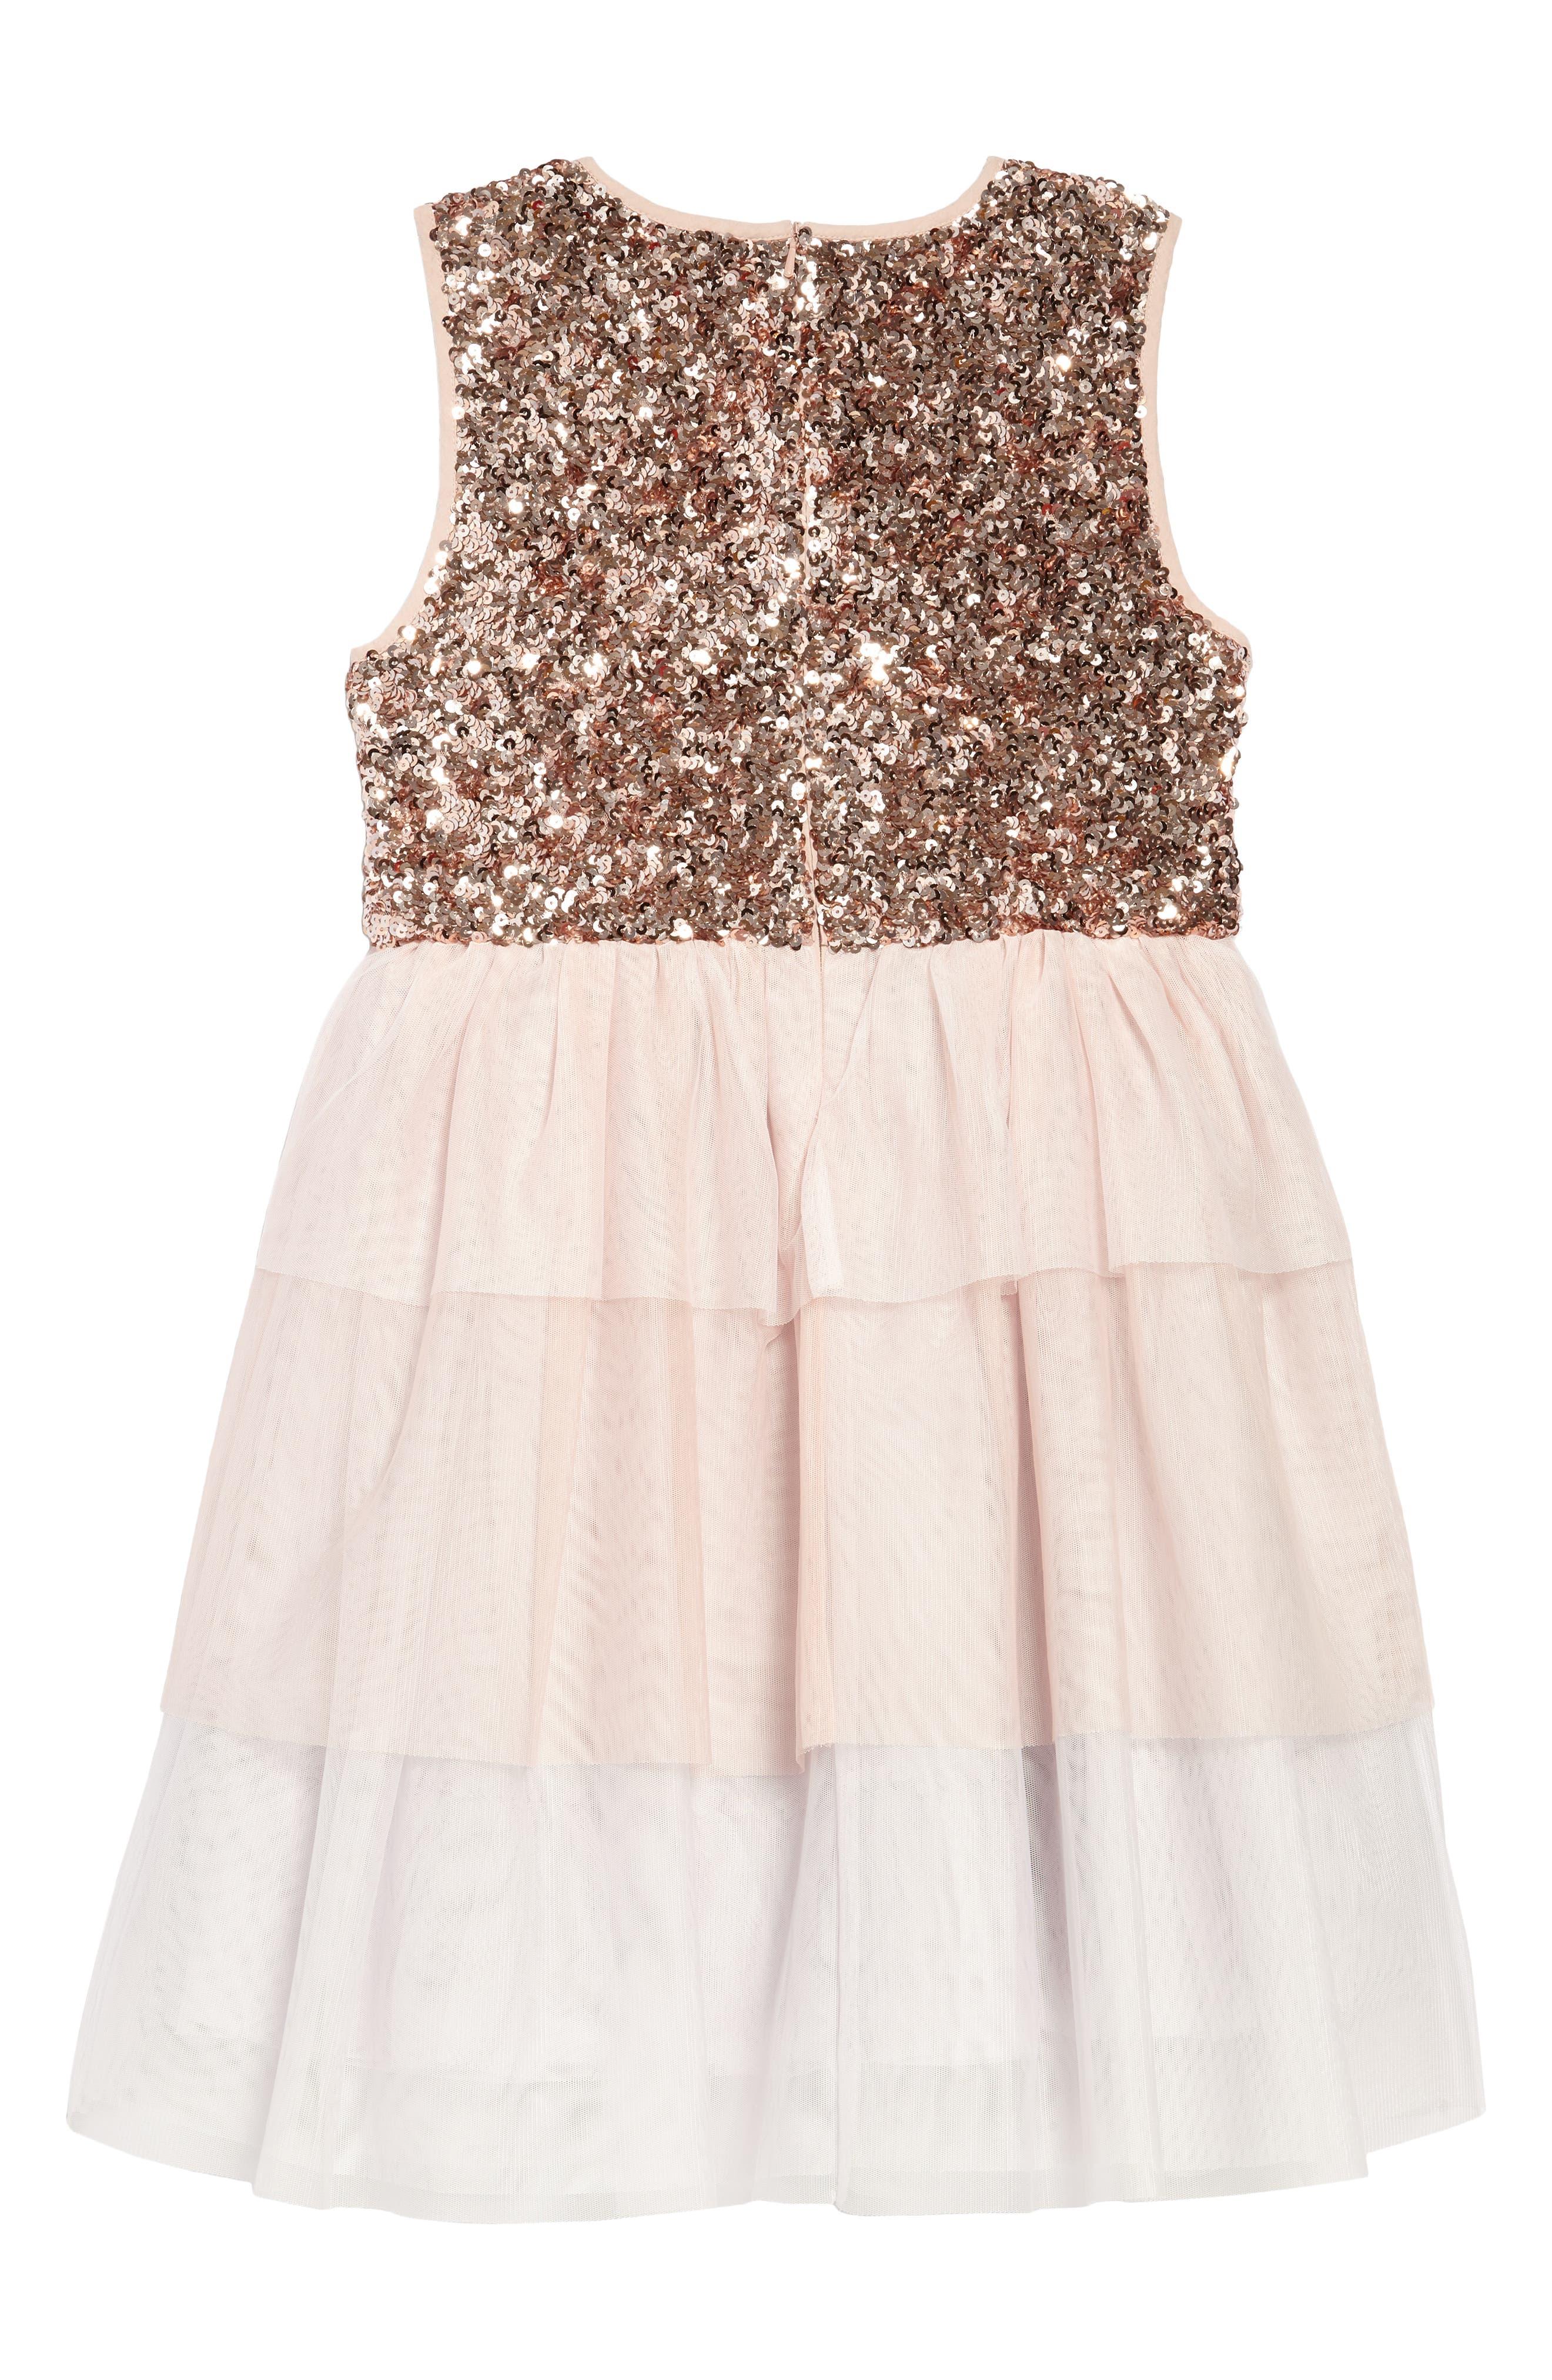 Sequin Tiered Tutu Dress,                             Alternate thumbnail 2, color,                             684